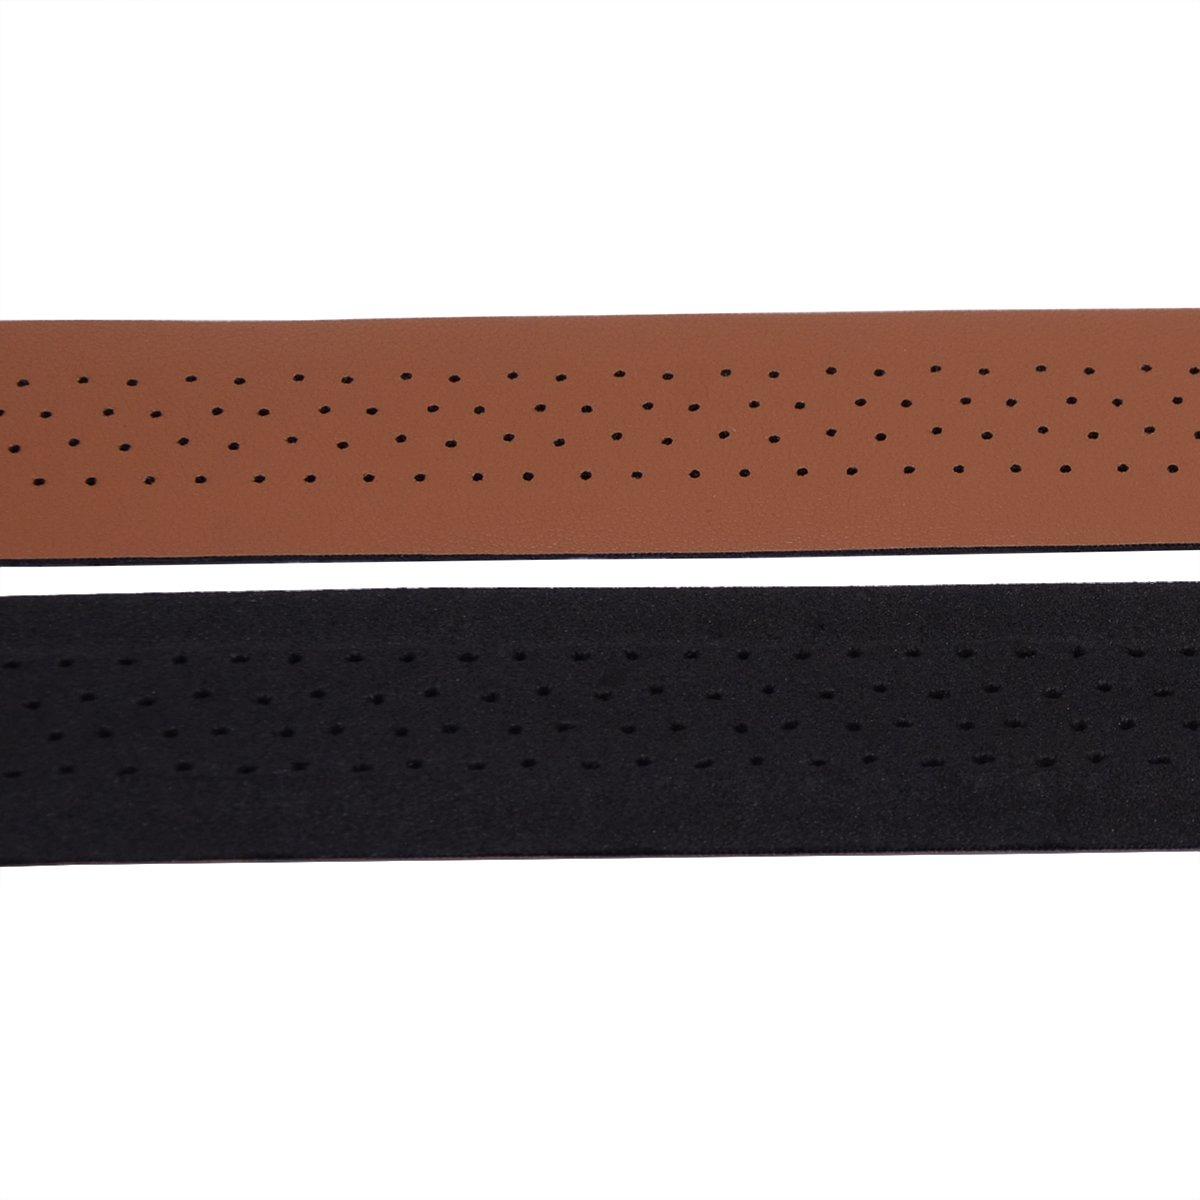 KINGOU Handlebar Tape Luxury PU Leather Bar Tape Fixed Gear//Road Bike Bar Wrap with 2 Reflective Plug